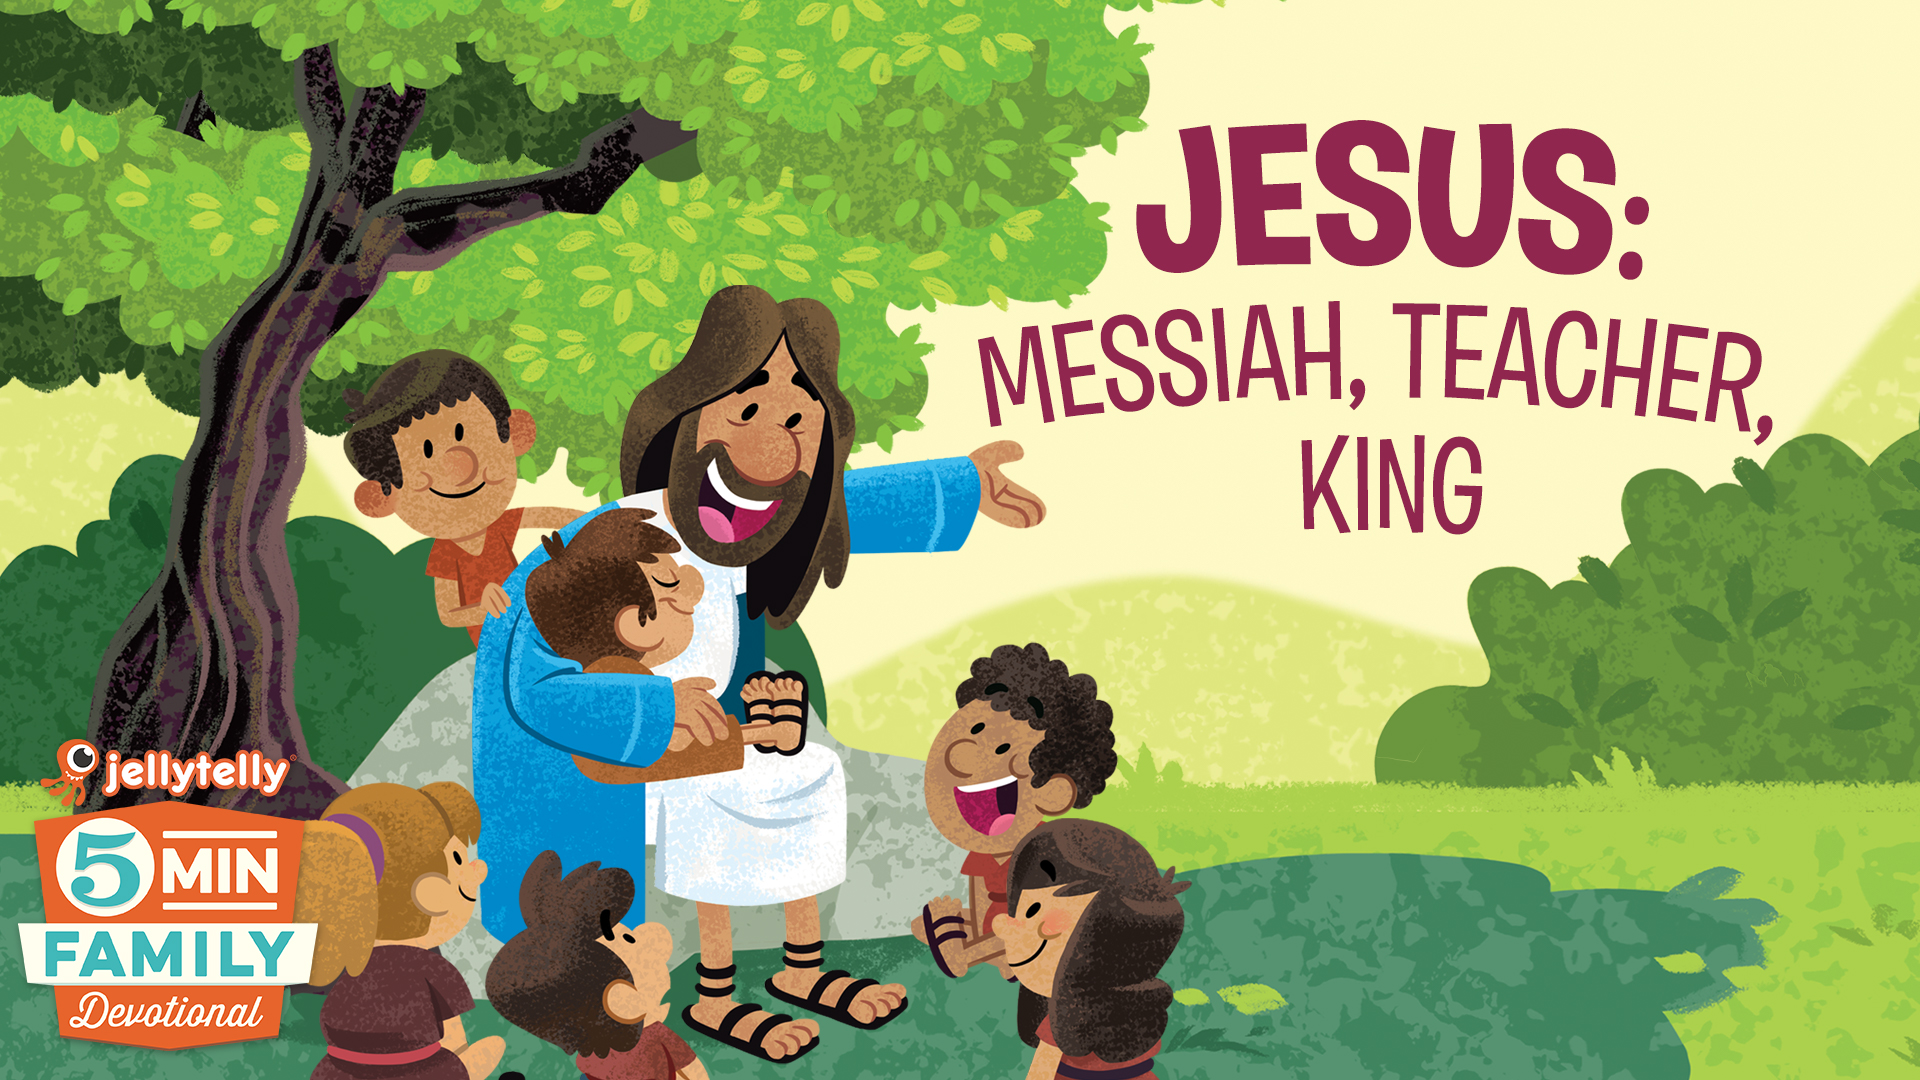 5mfd jesus series preview image